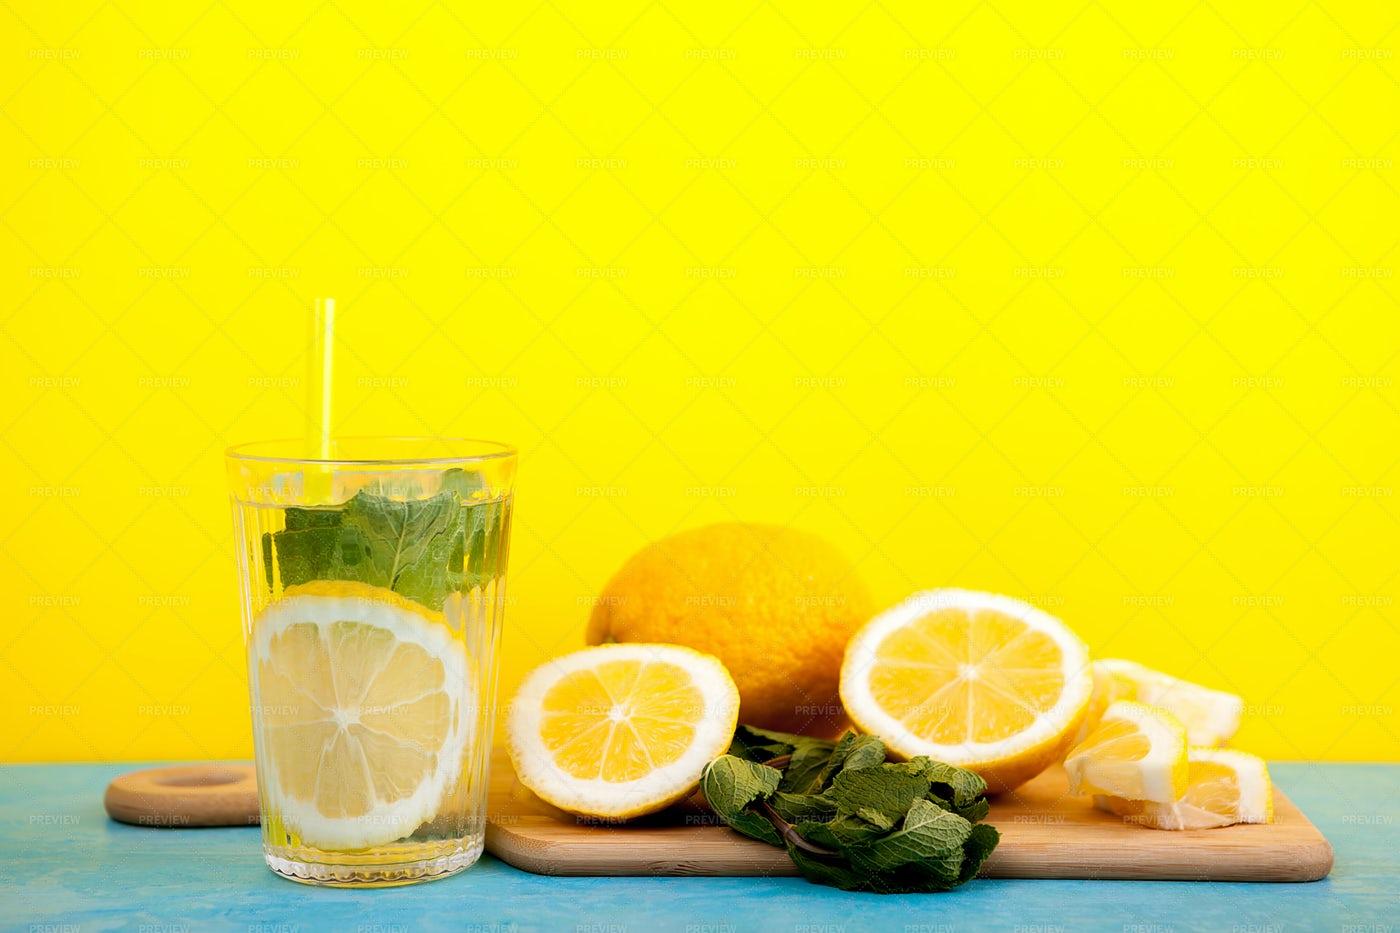 Organic Detox Water With Lemon: Stock Photos